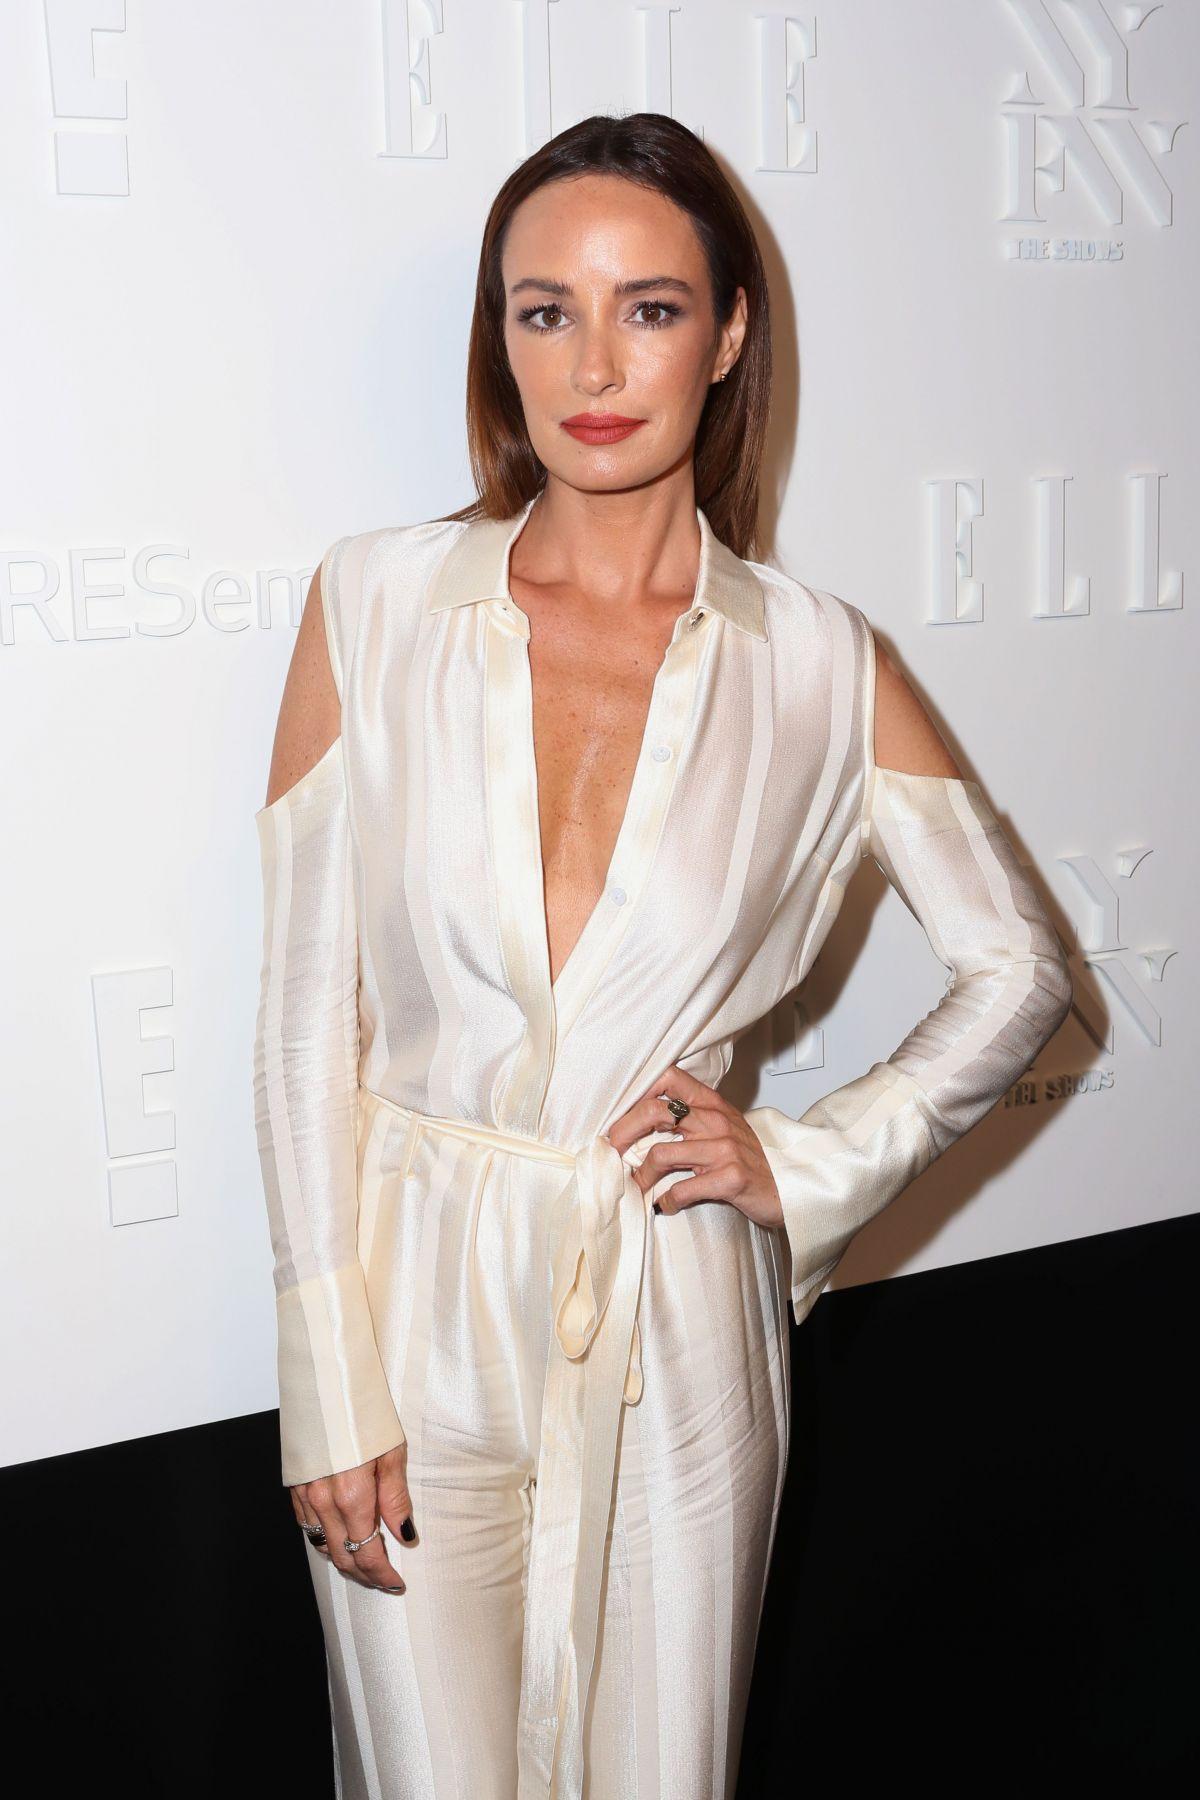 CATT SADLER at E!, Elle & Img Host New York Fashion Week Kickoff Party 09/06/2017